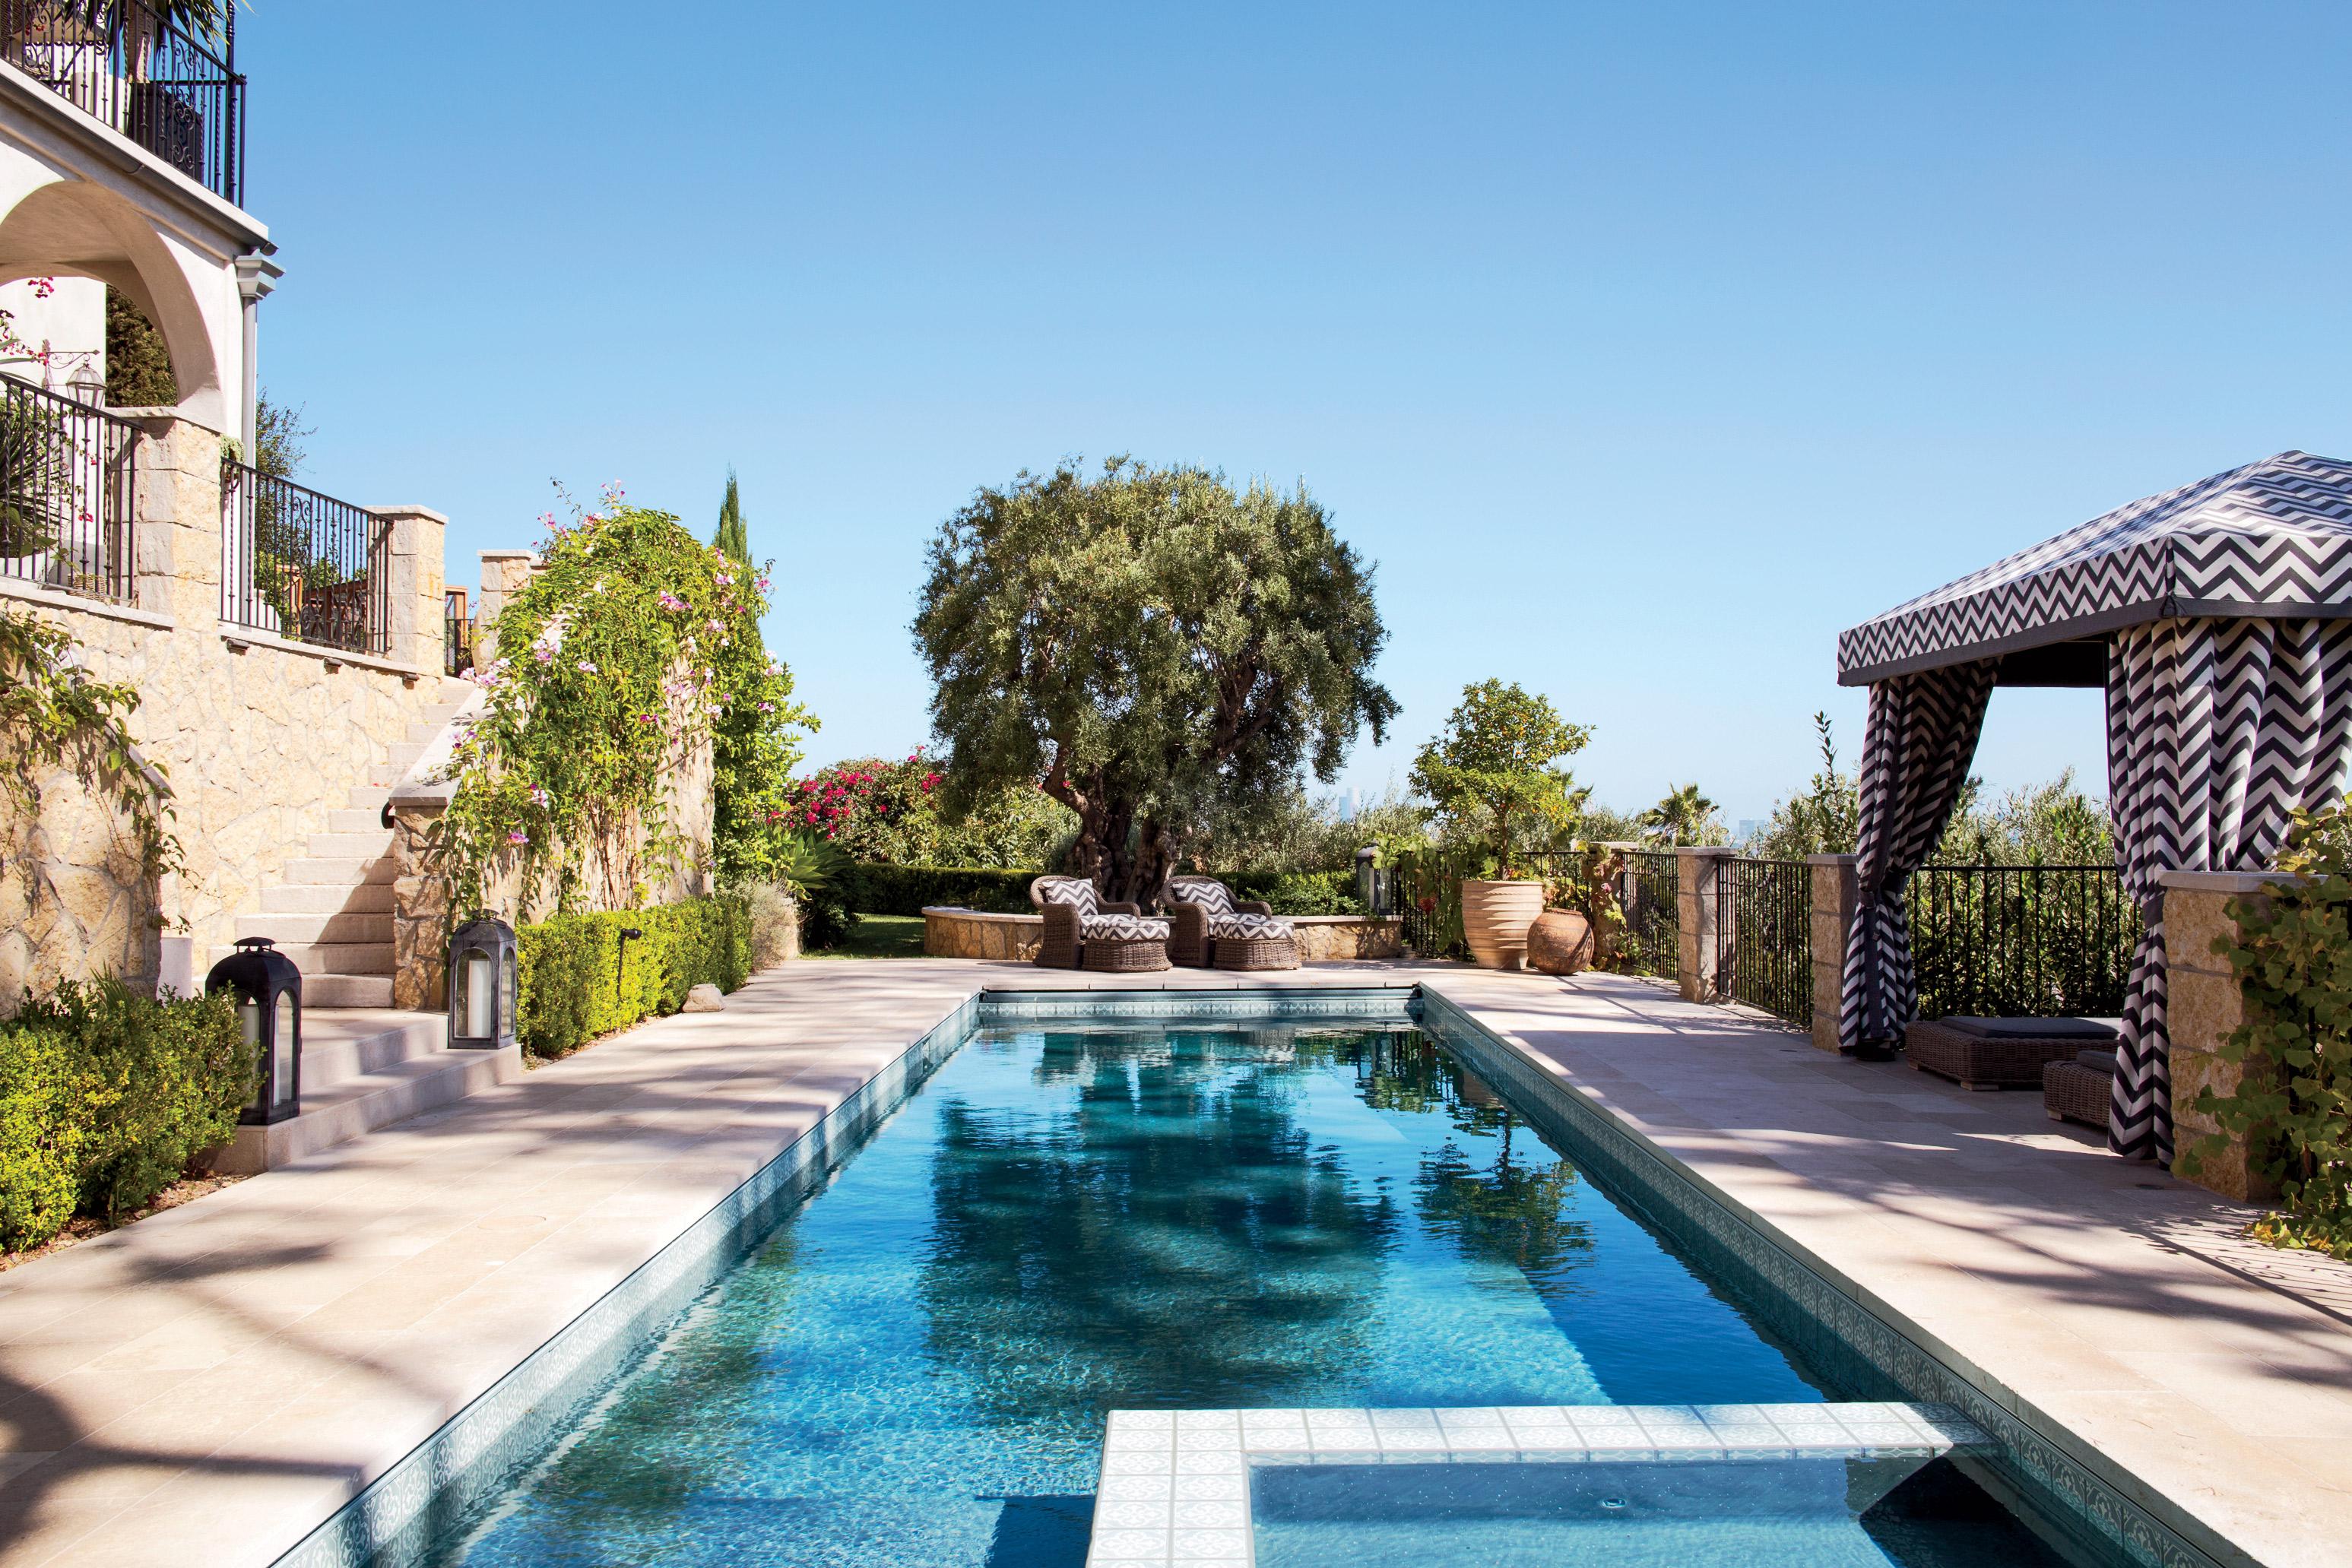 modern-pool-martyn-lawrence-bullard-design-los-angeles-ca-201411-3.jpg